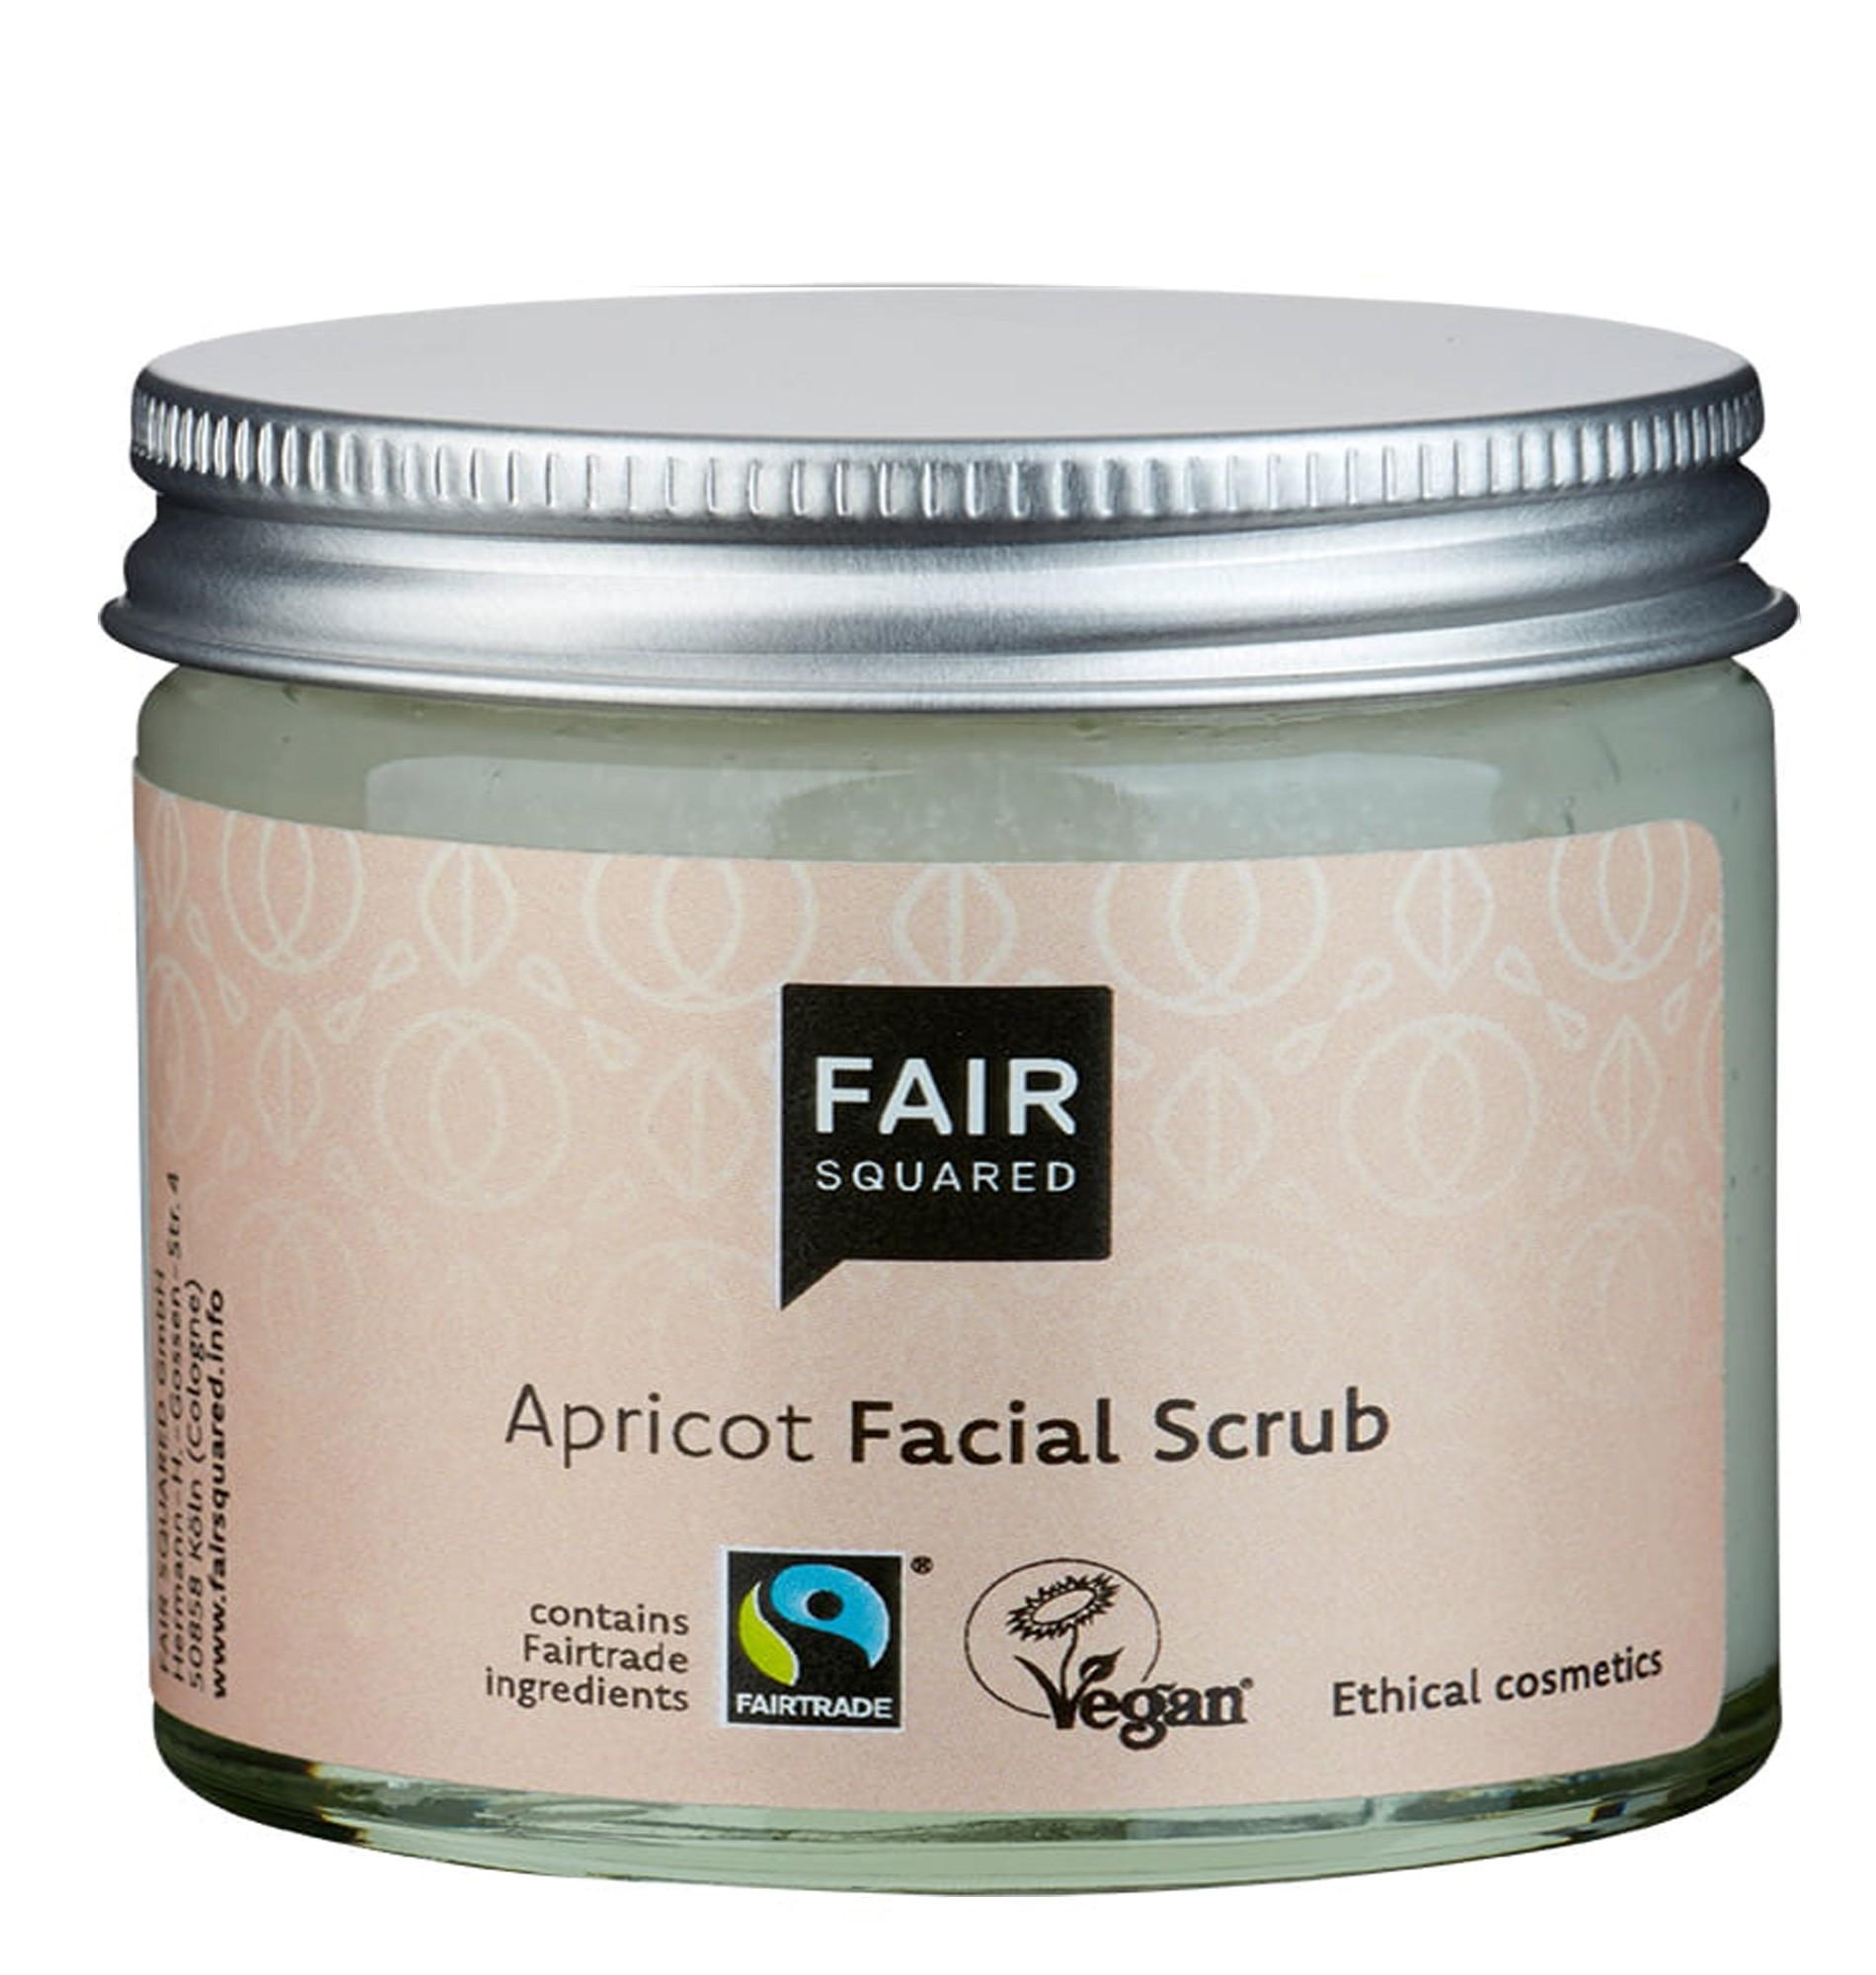 Fair Square Apricot Facial Scrub